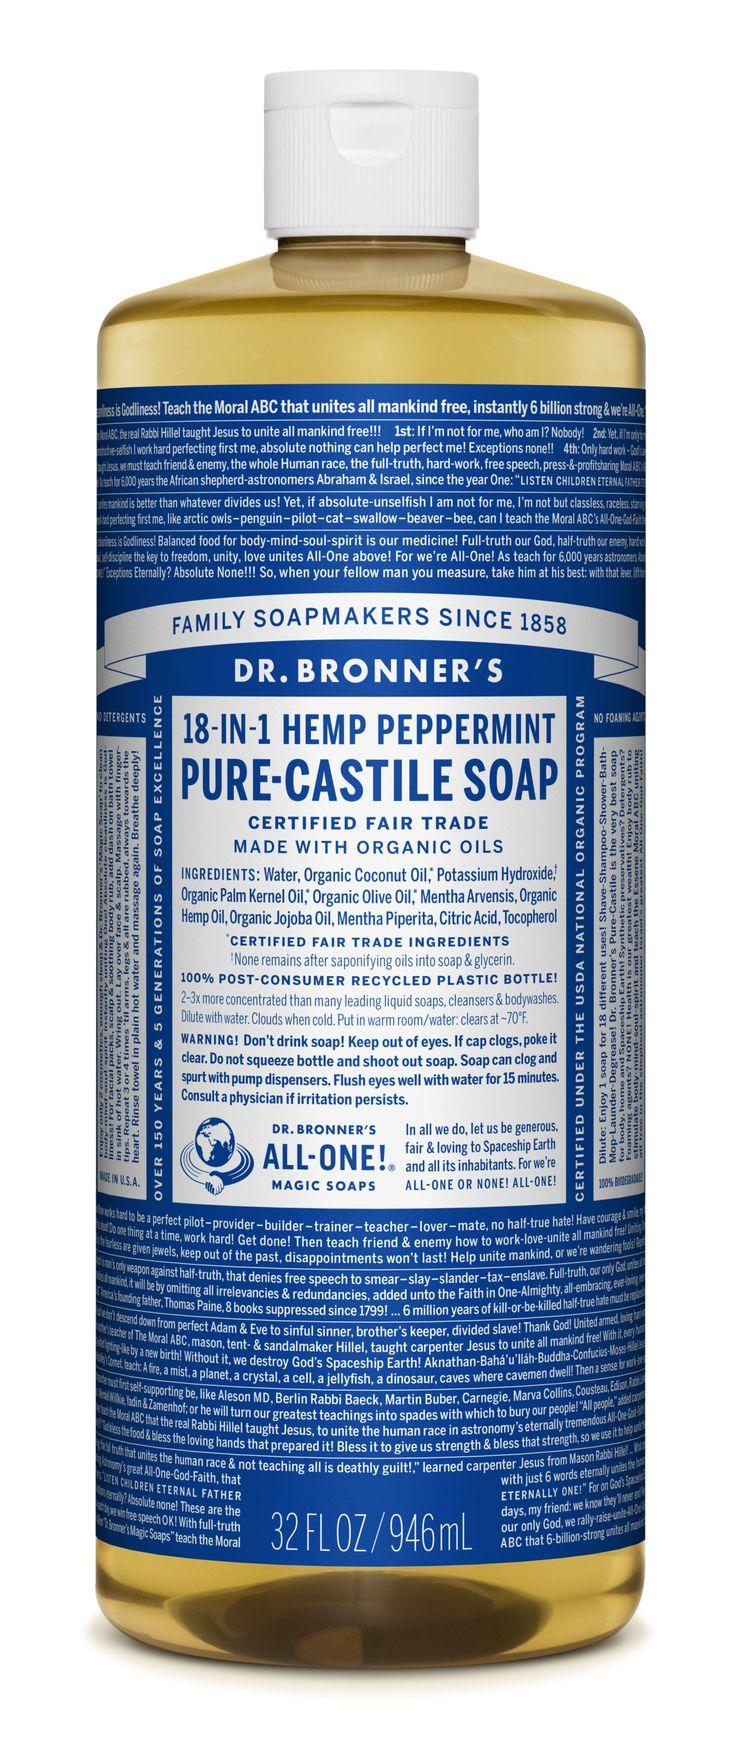 Dr. Bronner's 18-in-1 Hemp Peppermint Pure Castile Soap